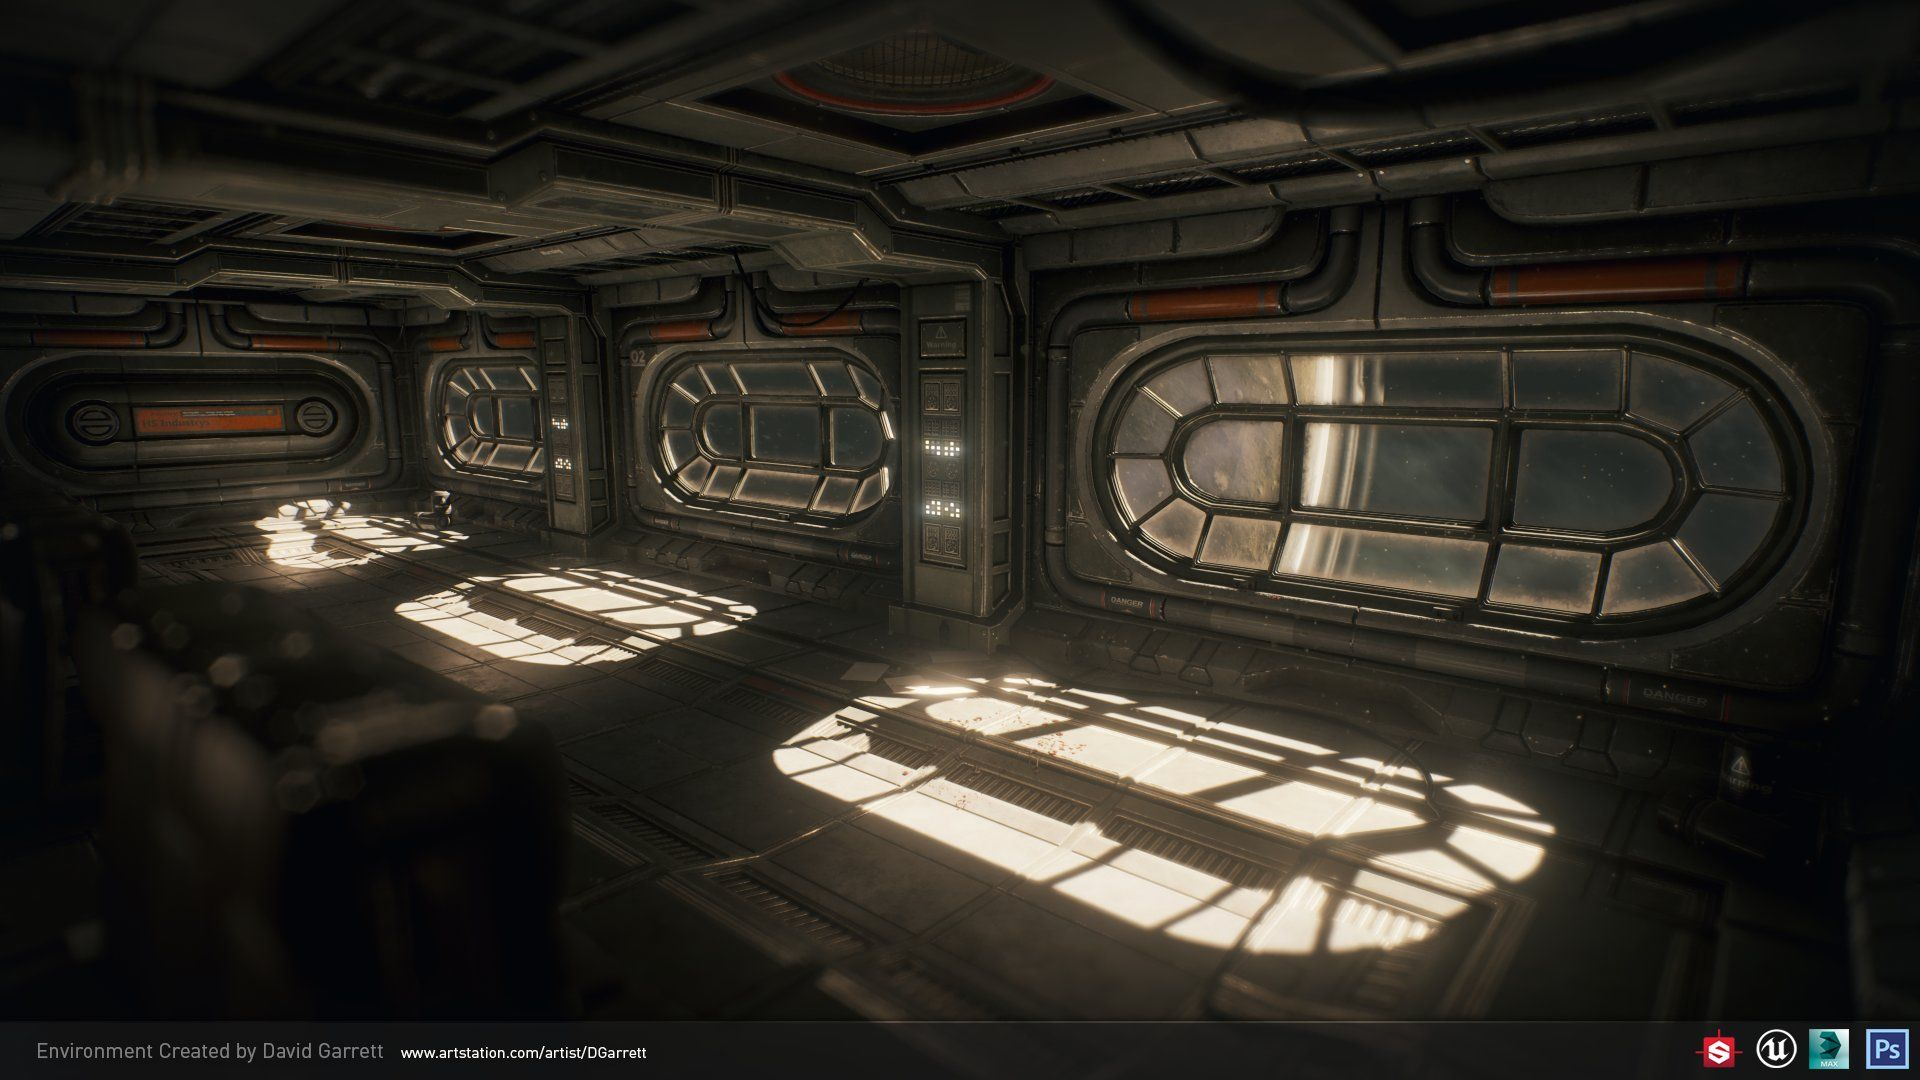 ArtStation - Spaceship interior UE4 environment, David Garrett